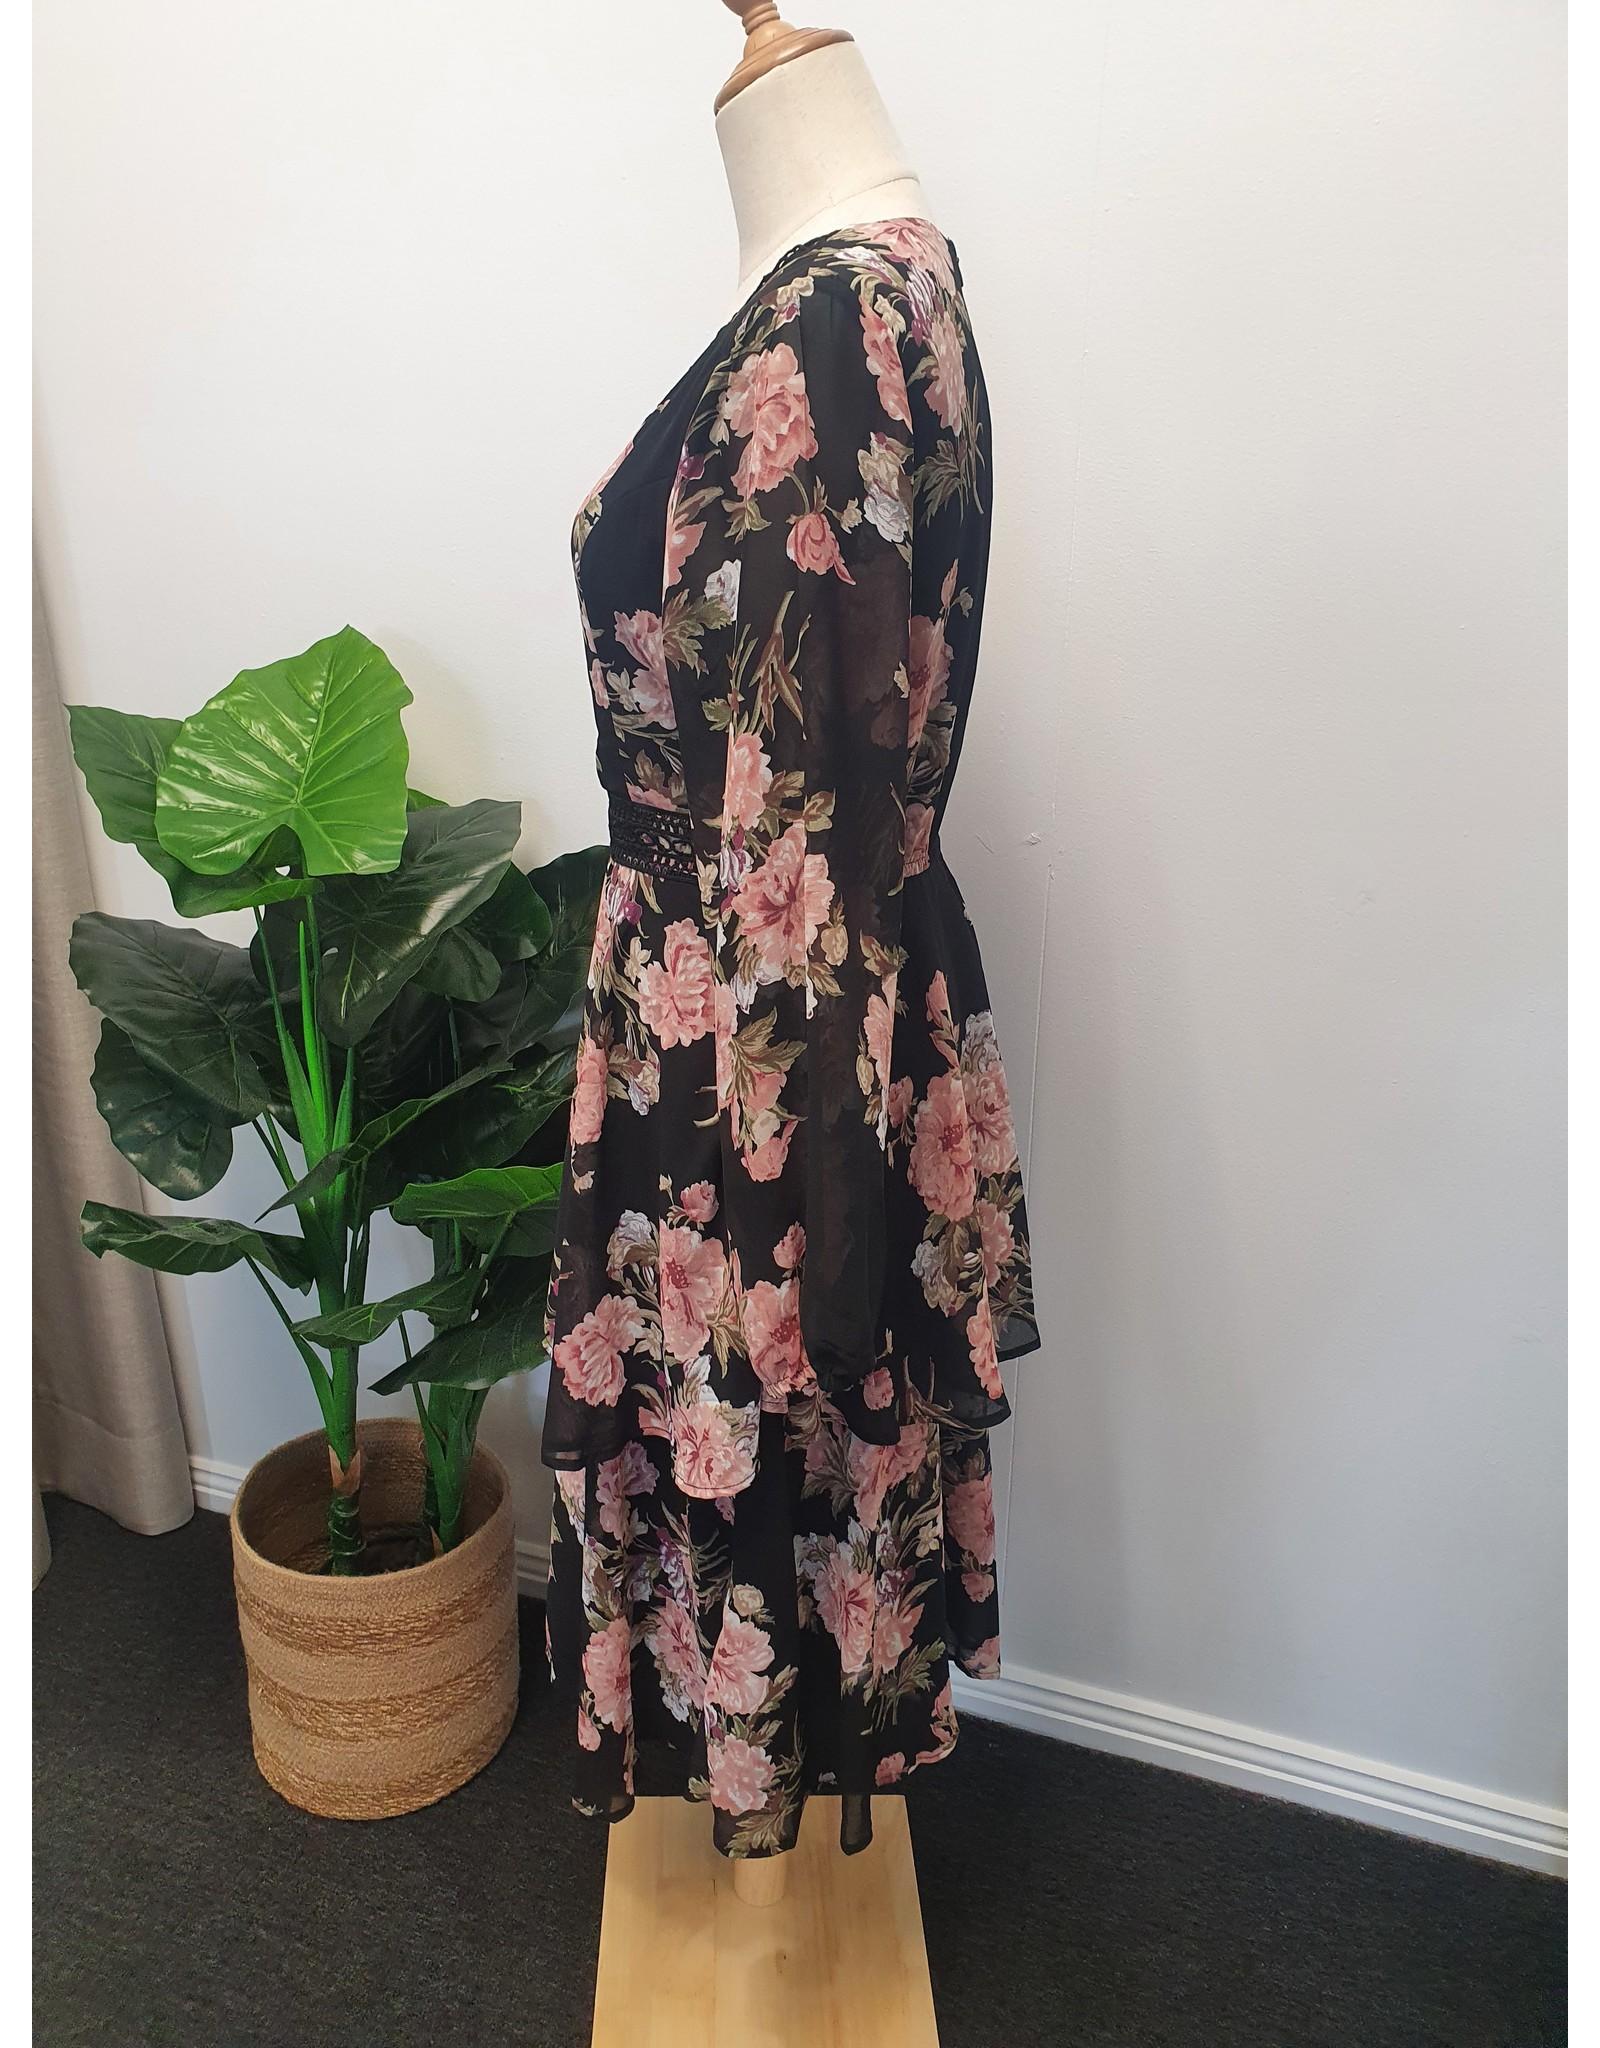 Lorraine Black Layered Floral dress